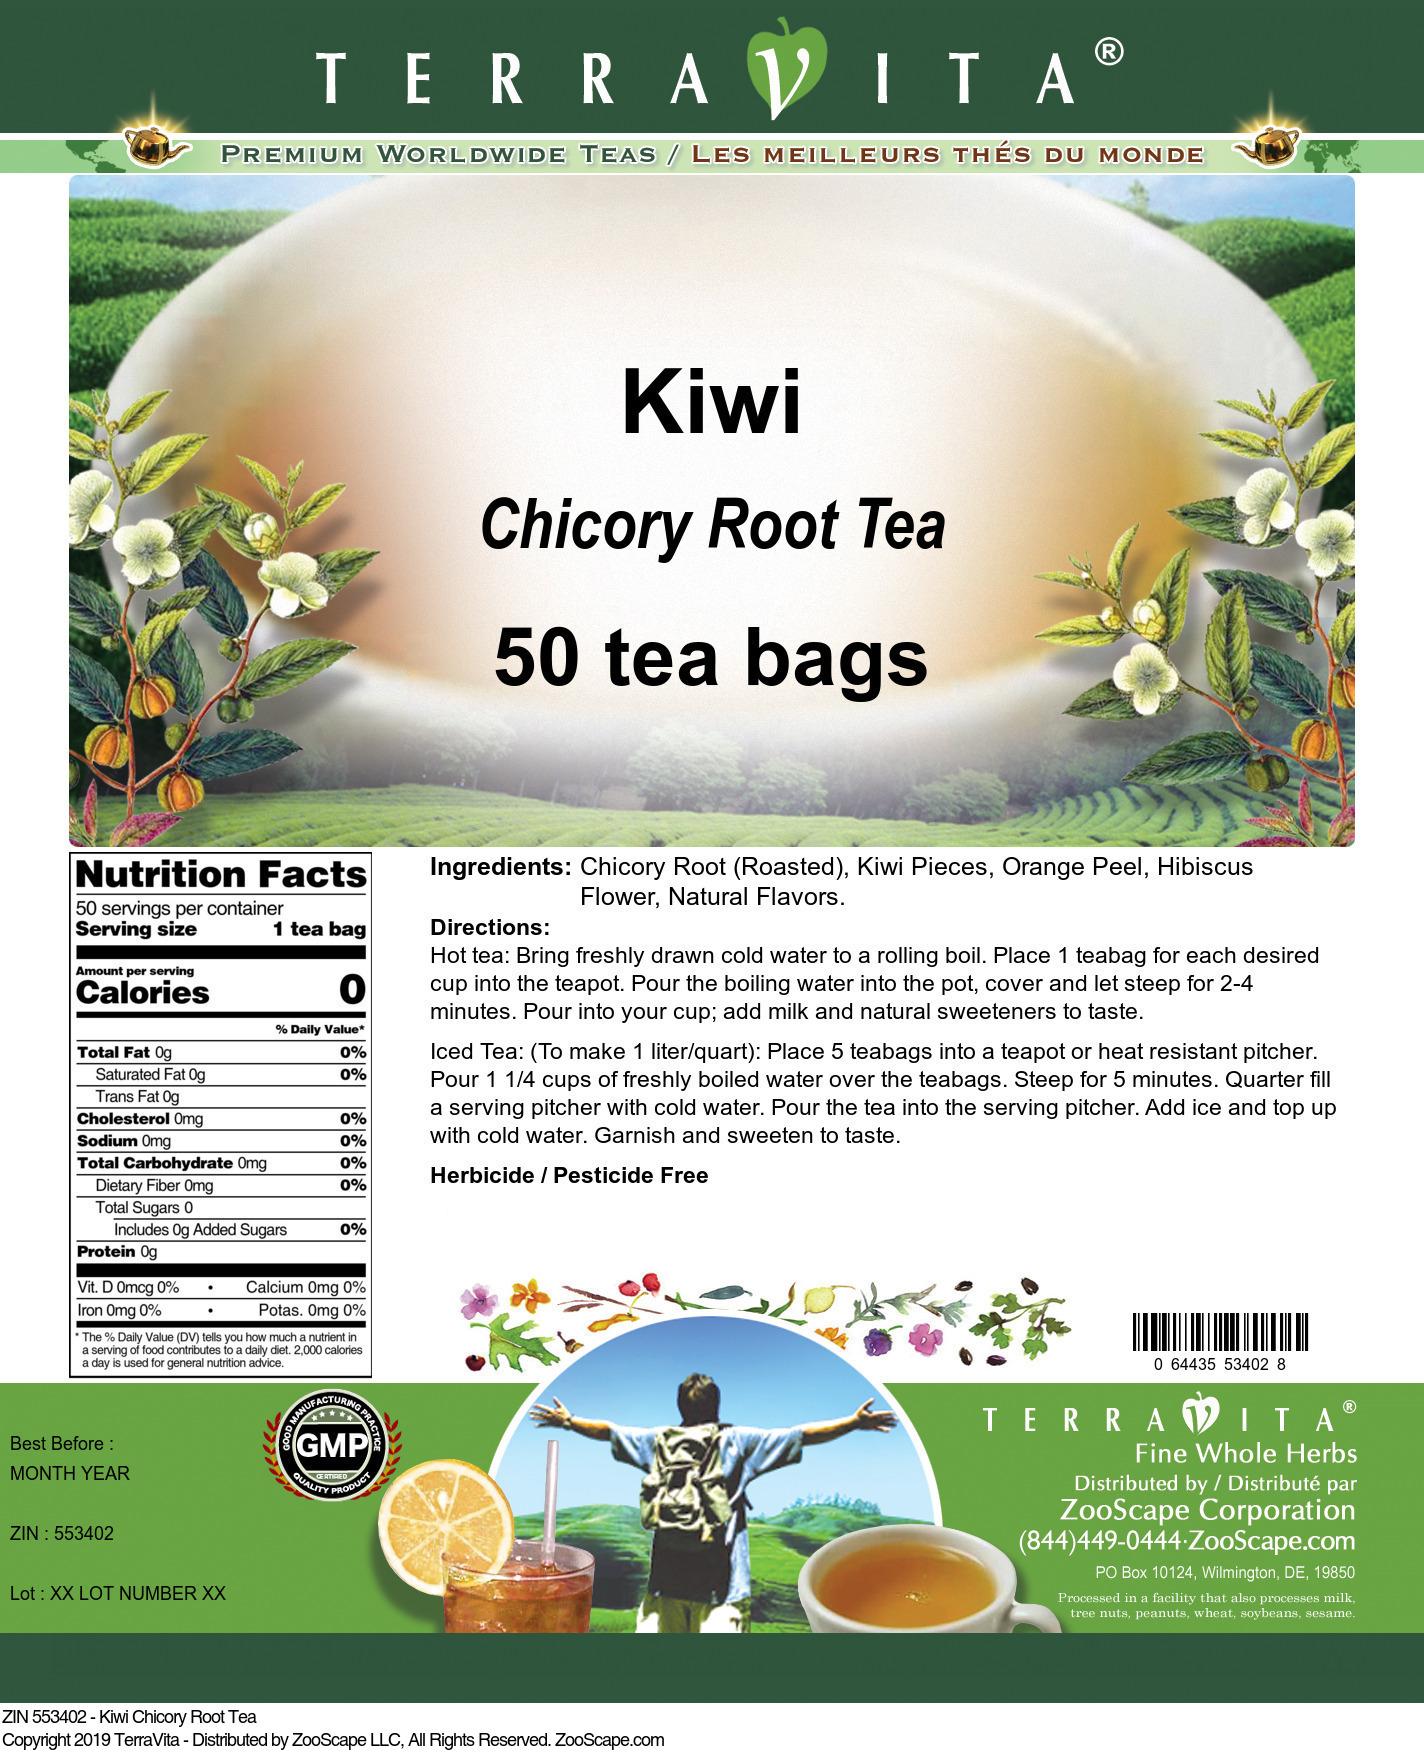 Kiwi Chicory Root